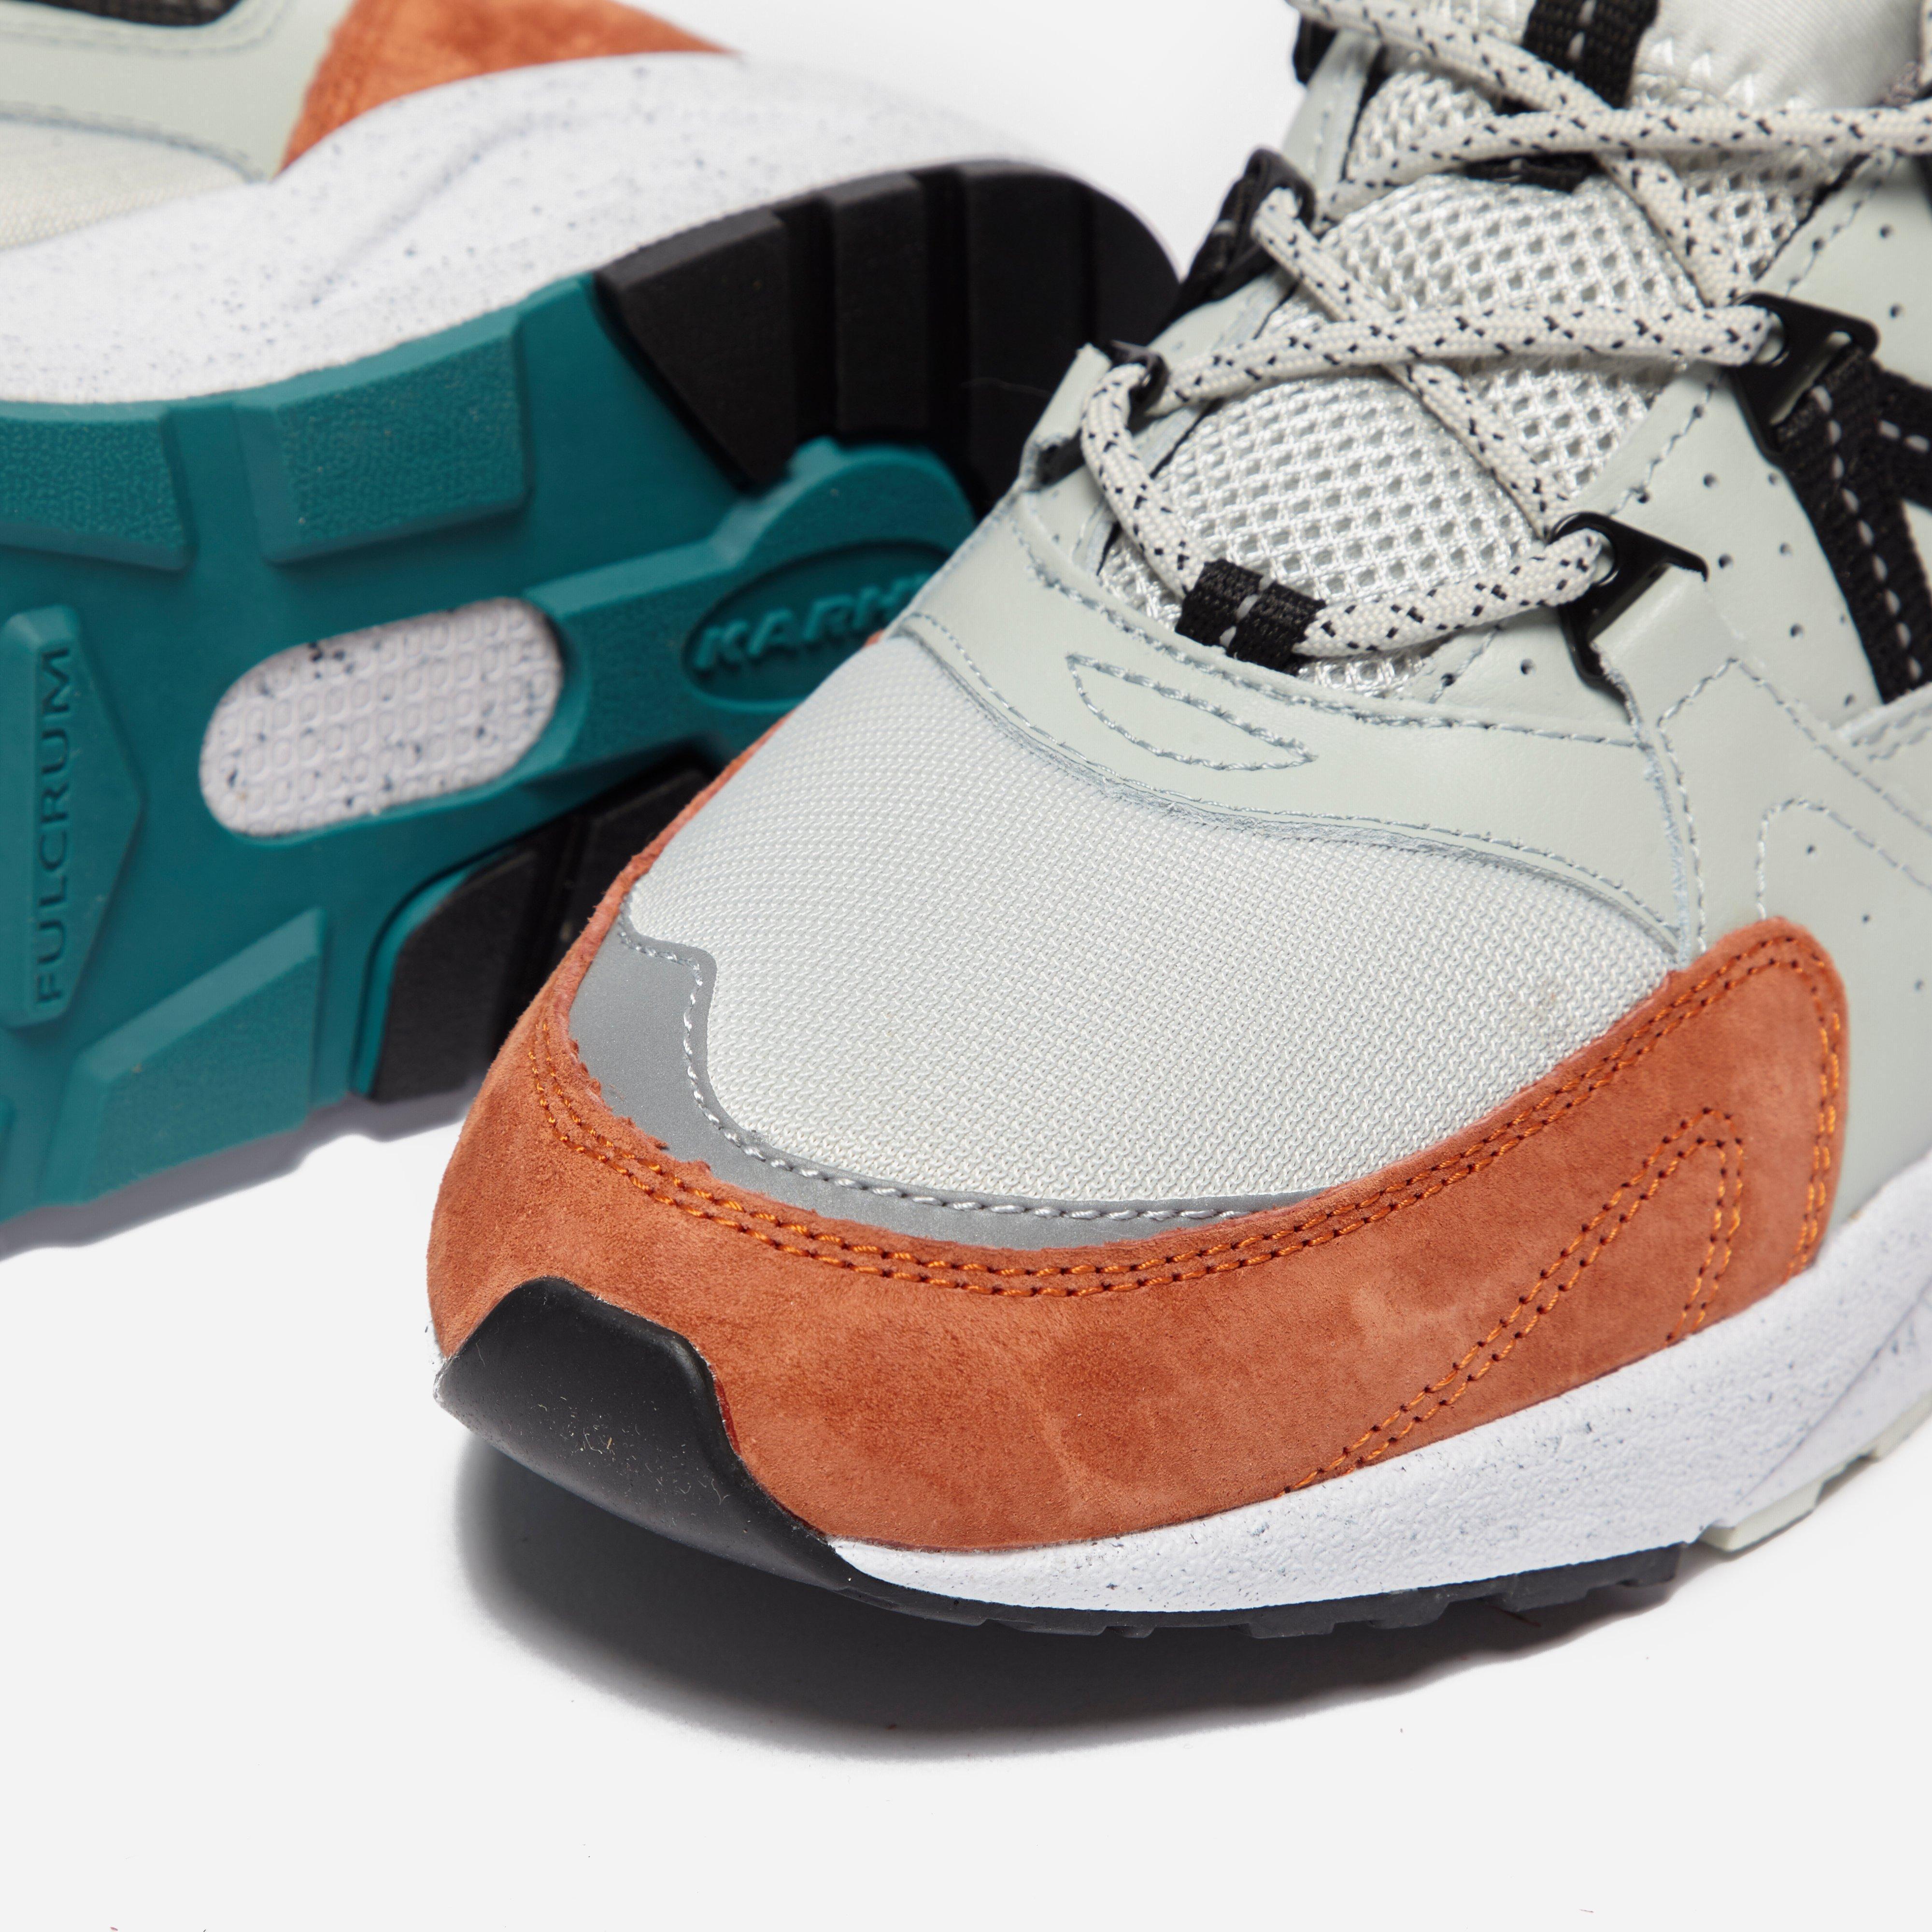 Karhu Fusion 2.0 in Orange for Men